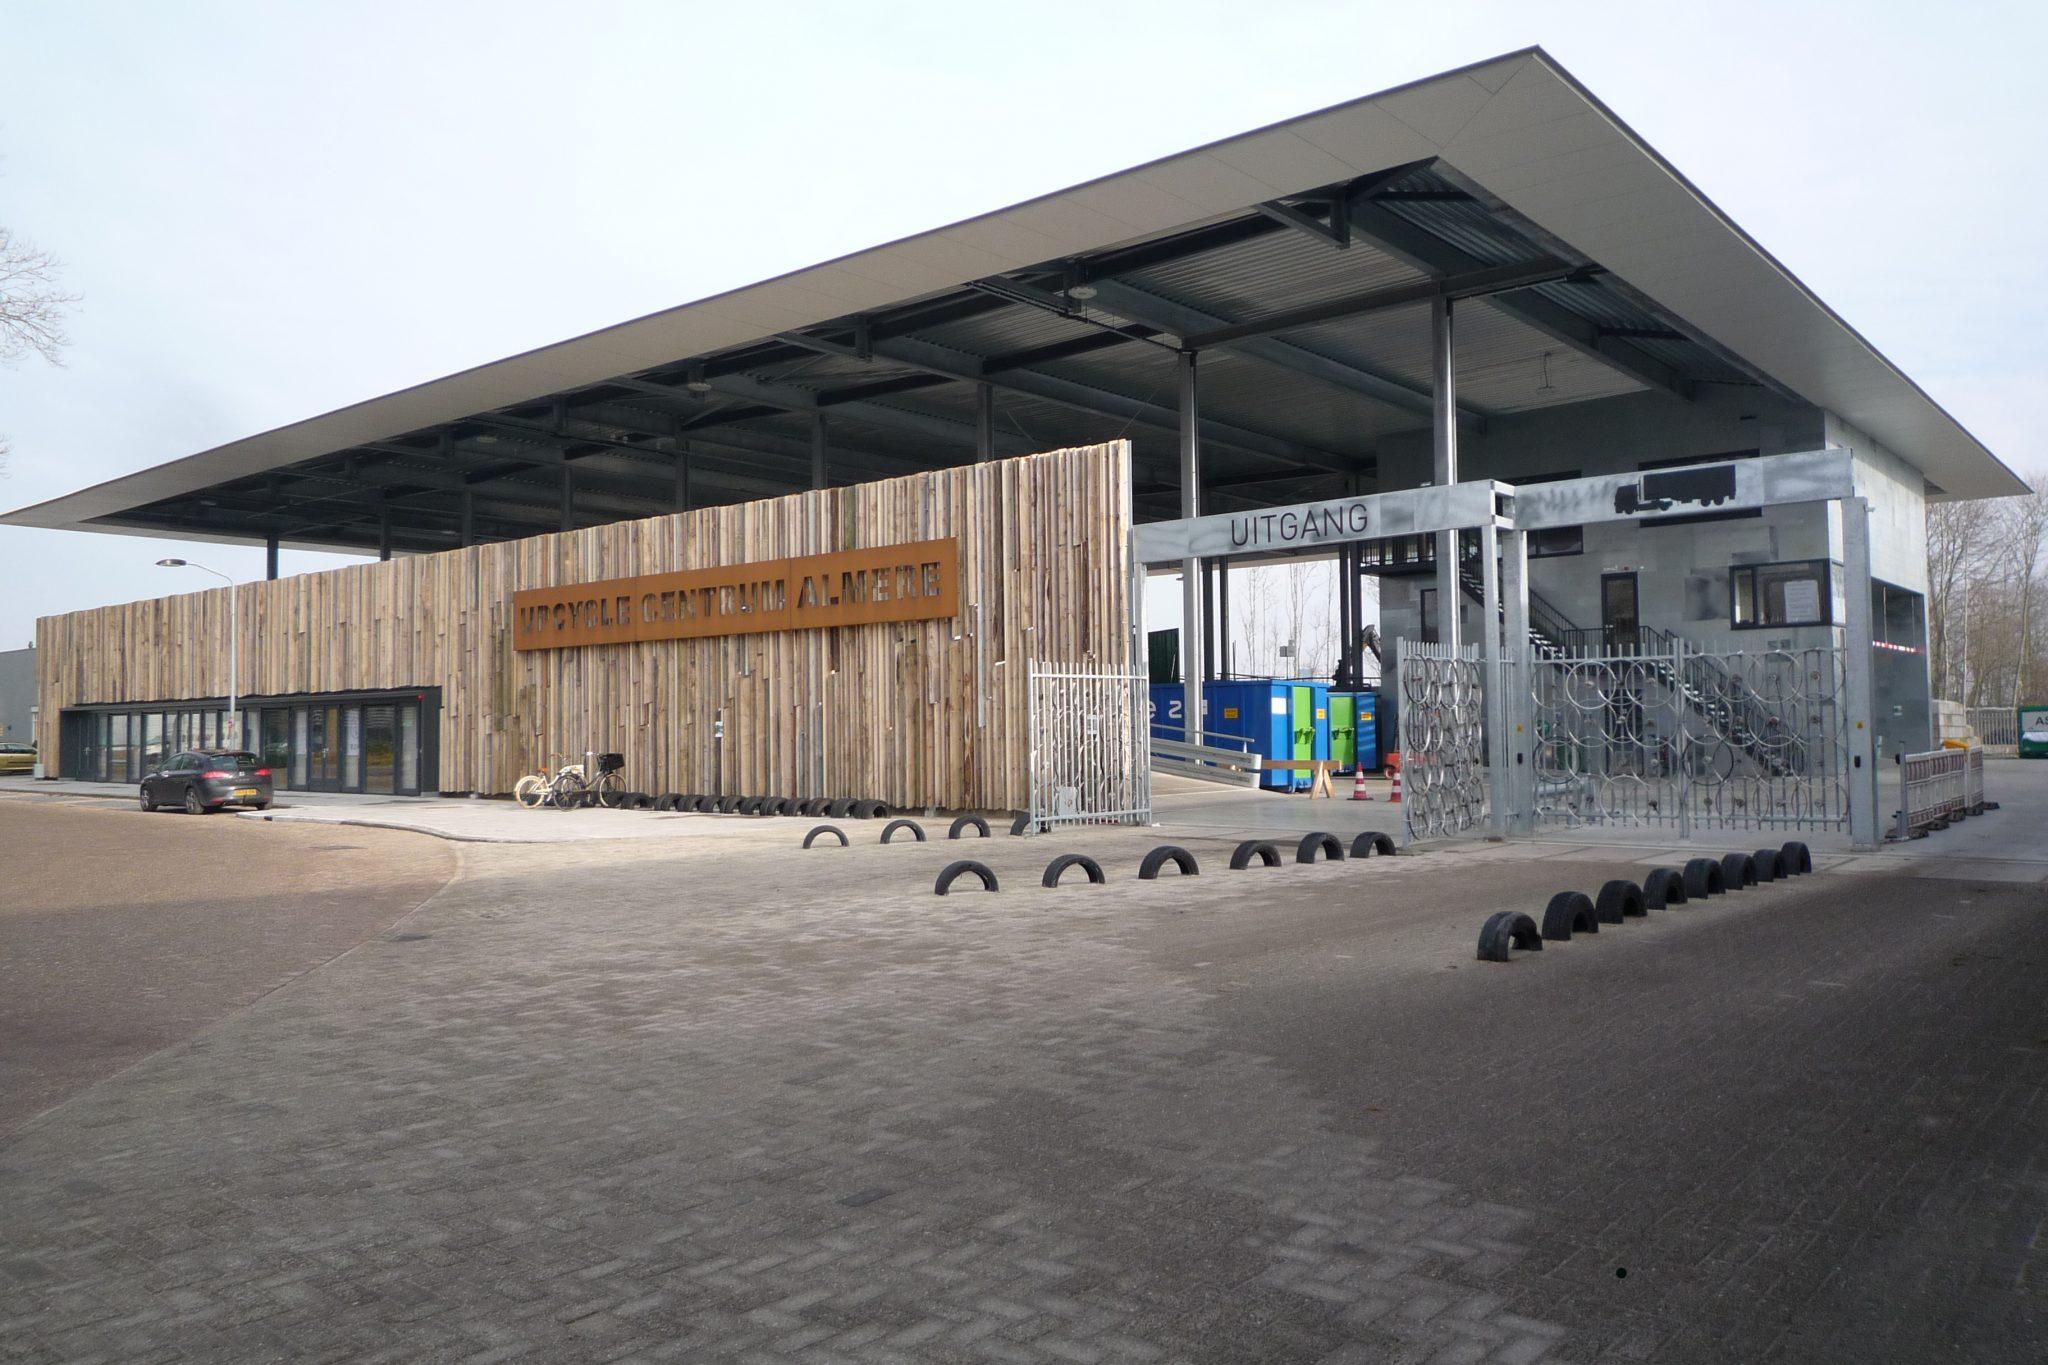 upcycle centrum almere, hergebruikte materialen, circulair bouwen, sloophout